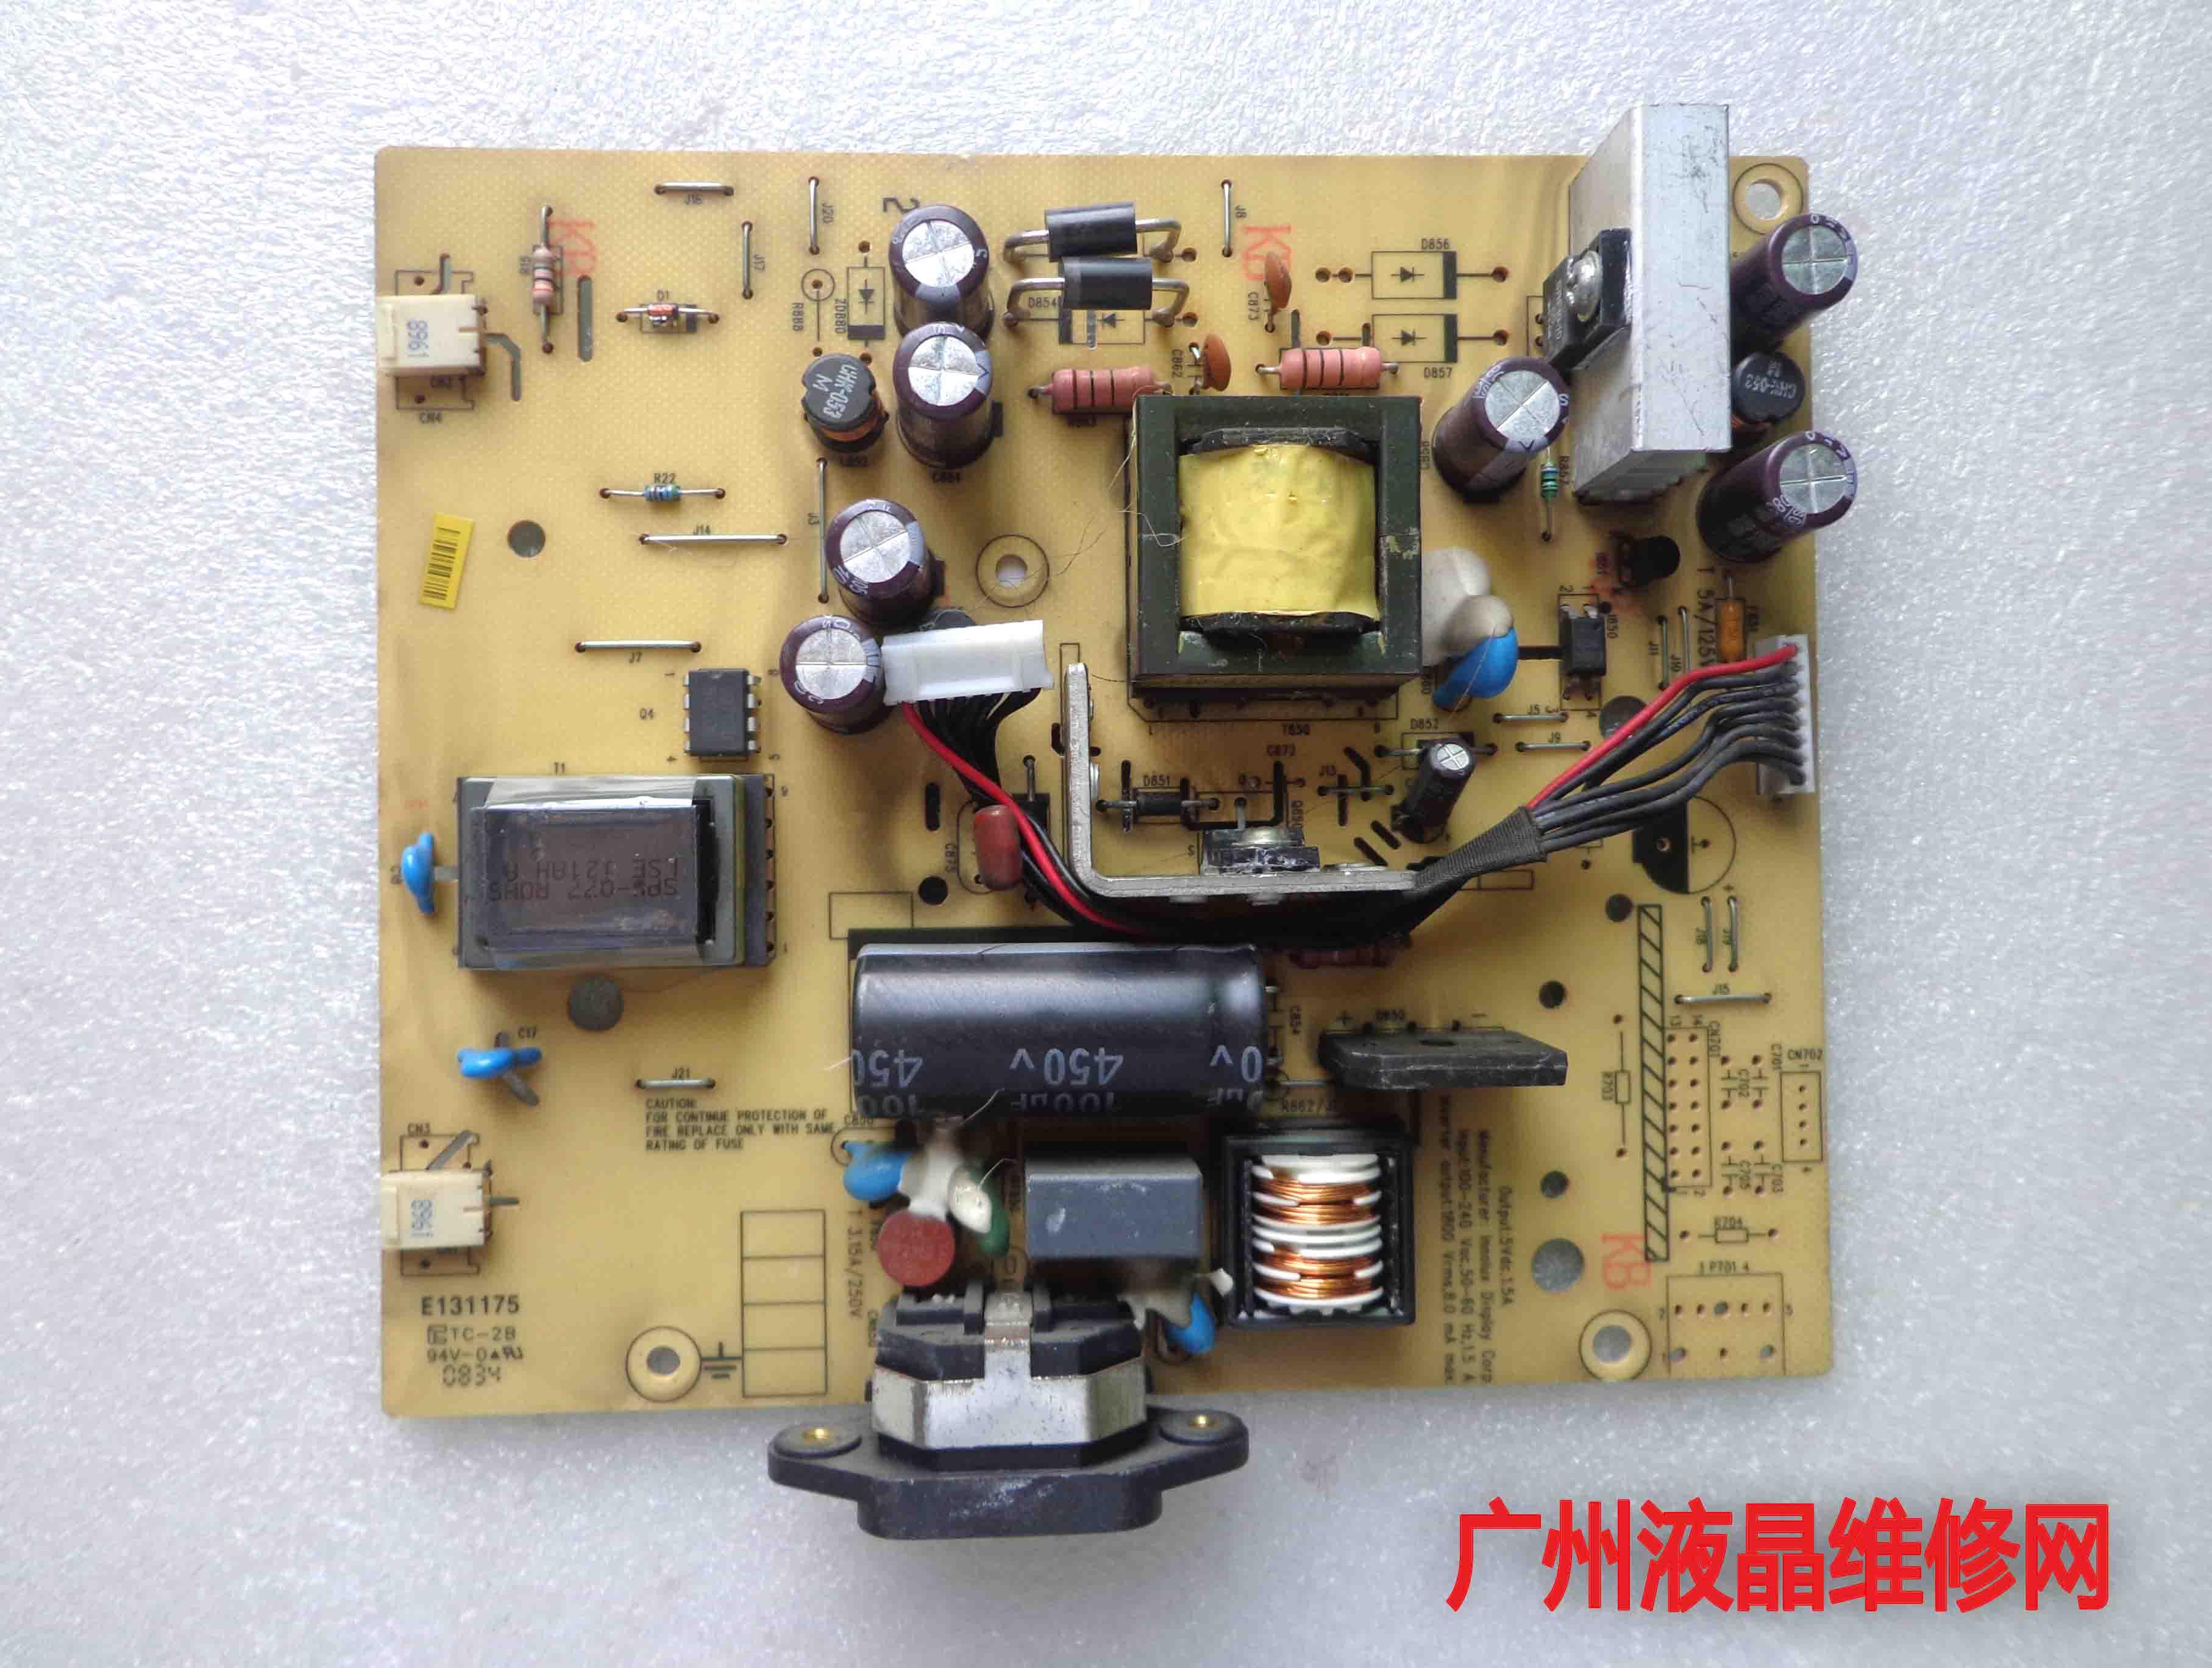 ILPI-132 power supply board power supply board L2240PWD association L2240PWD pressure plate